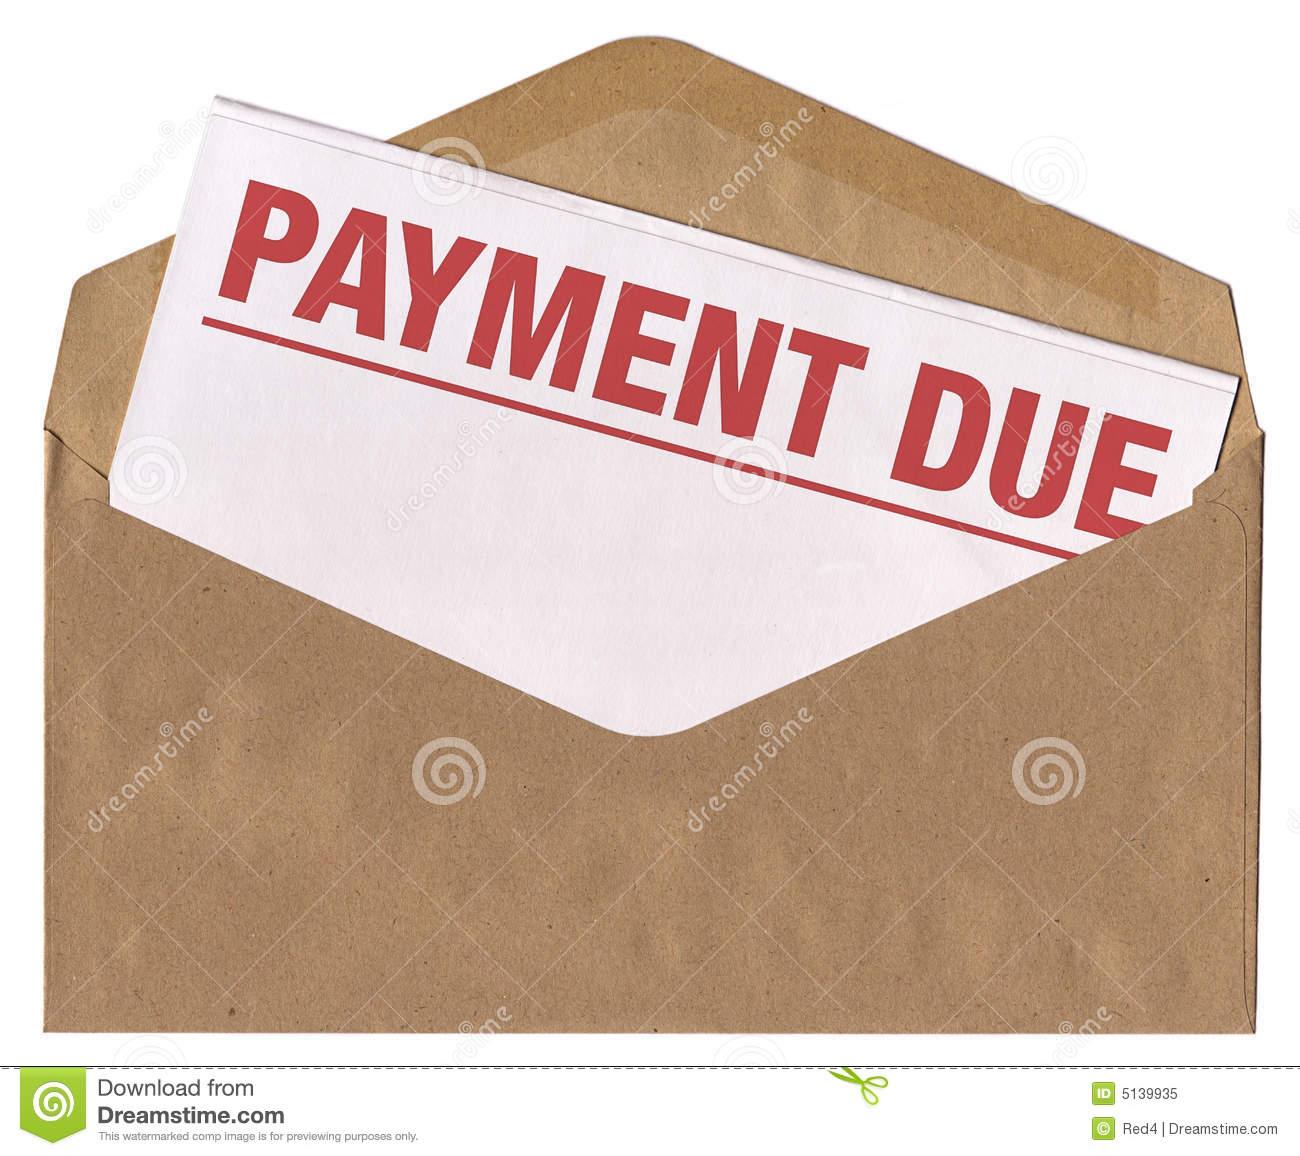 Bills clipart bill due, Bills bill due Transparent FREE for.